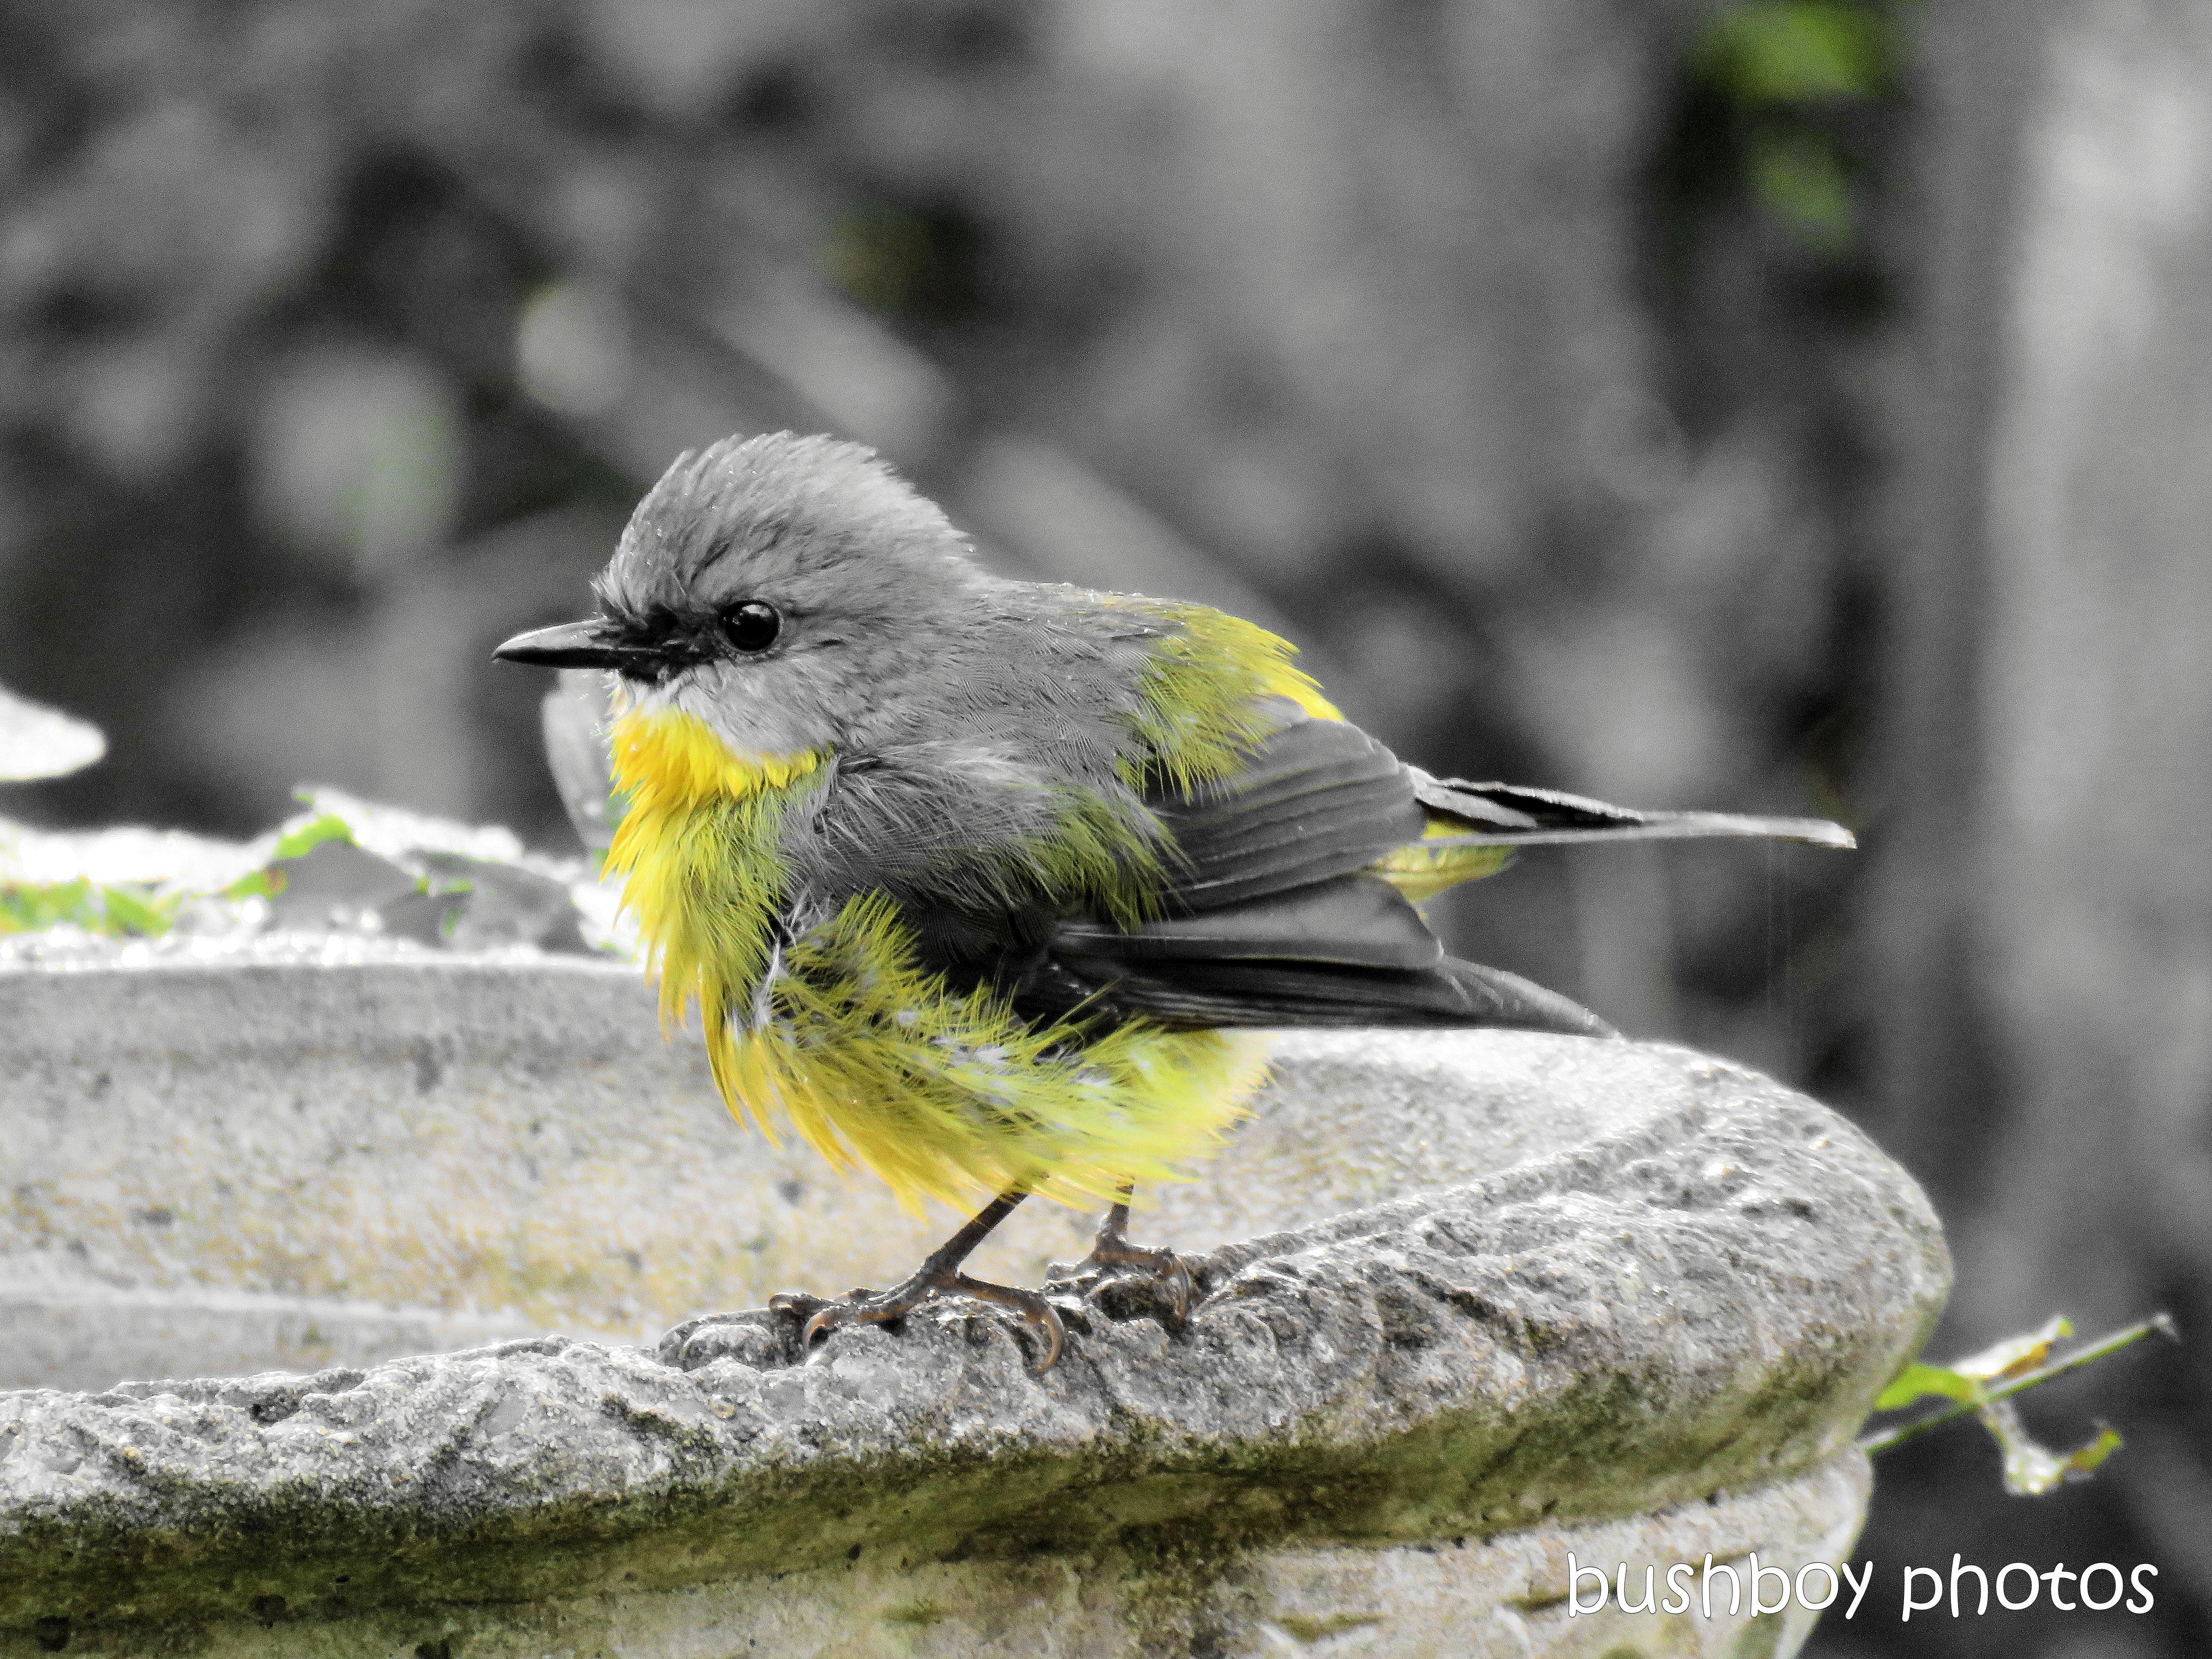 190412_blog_challenge_blackandwhite_water_birdbath_eastern_yellow_robin7